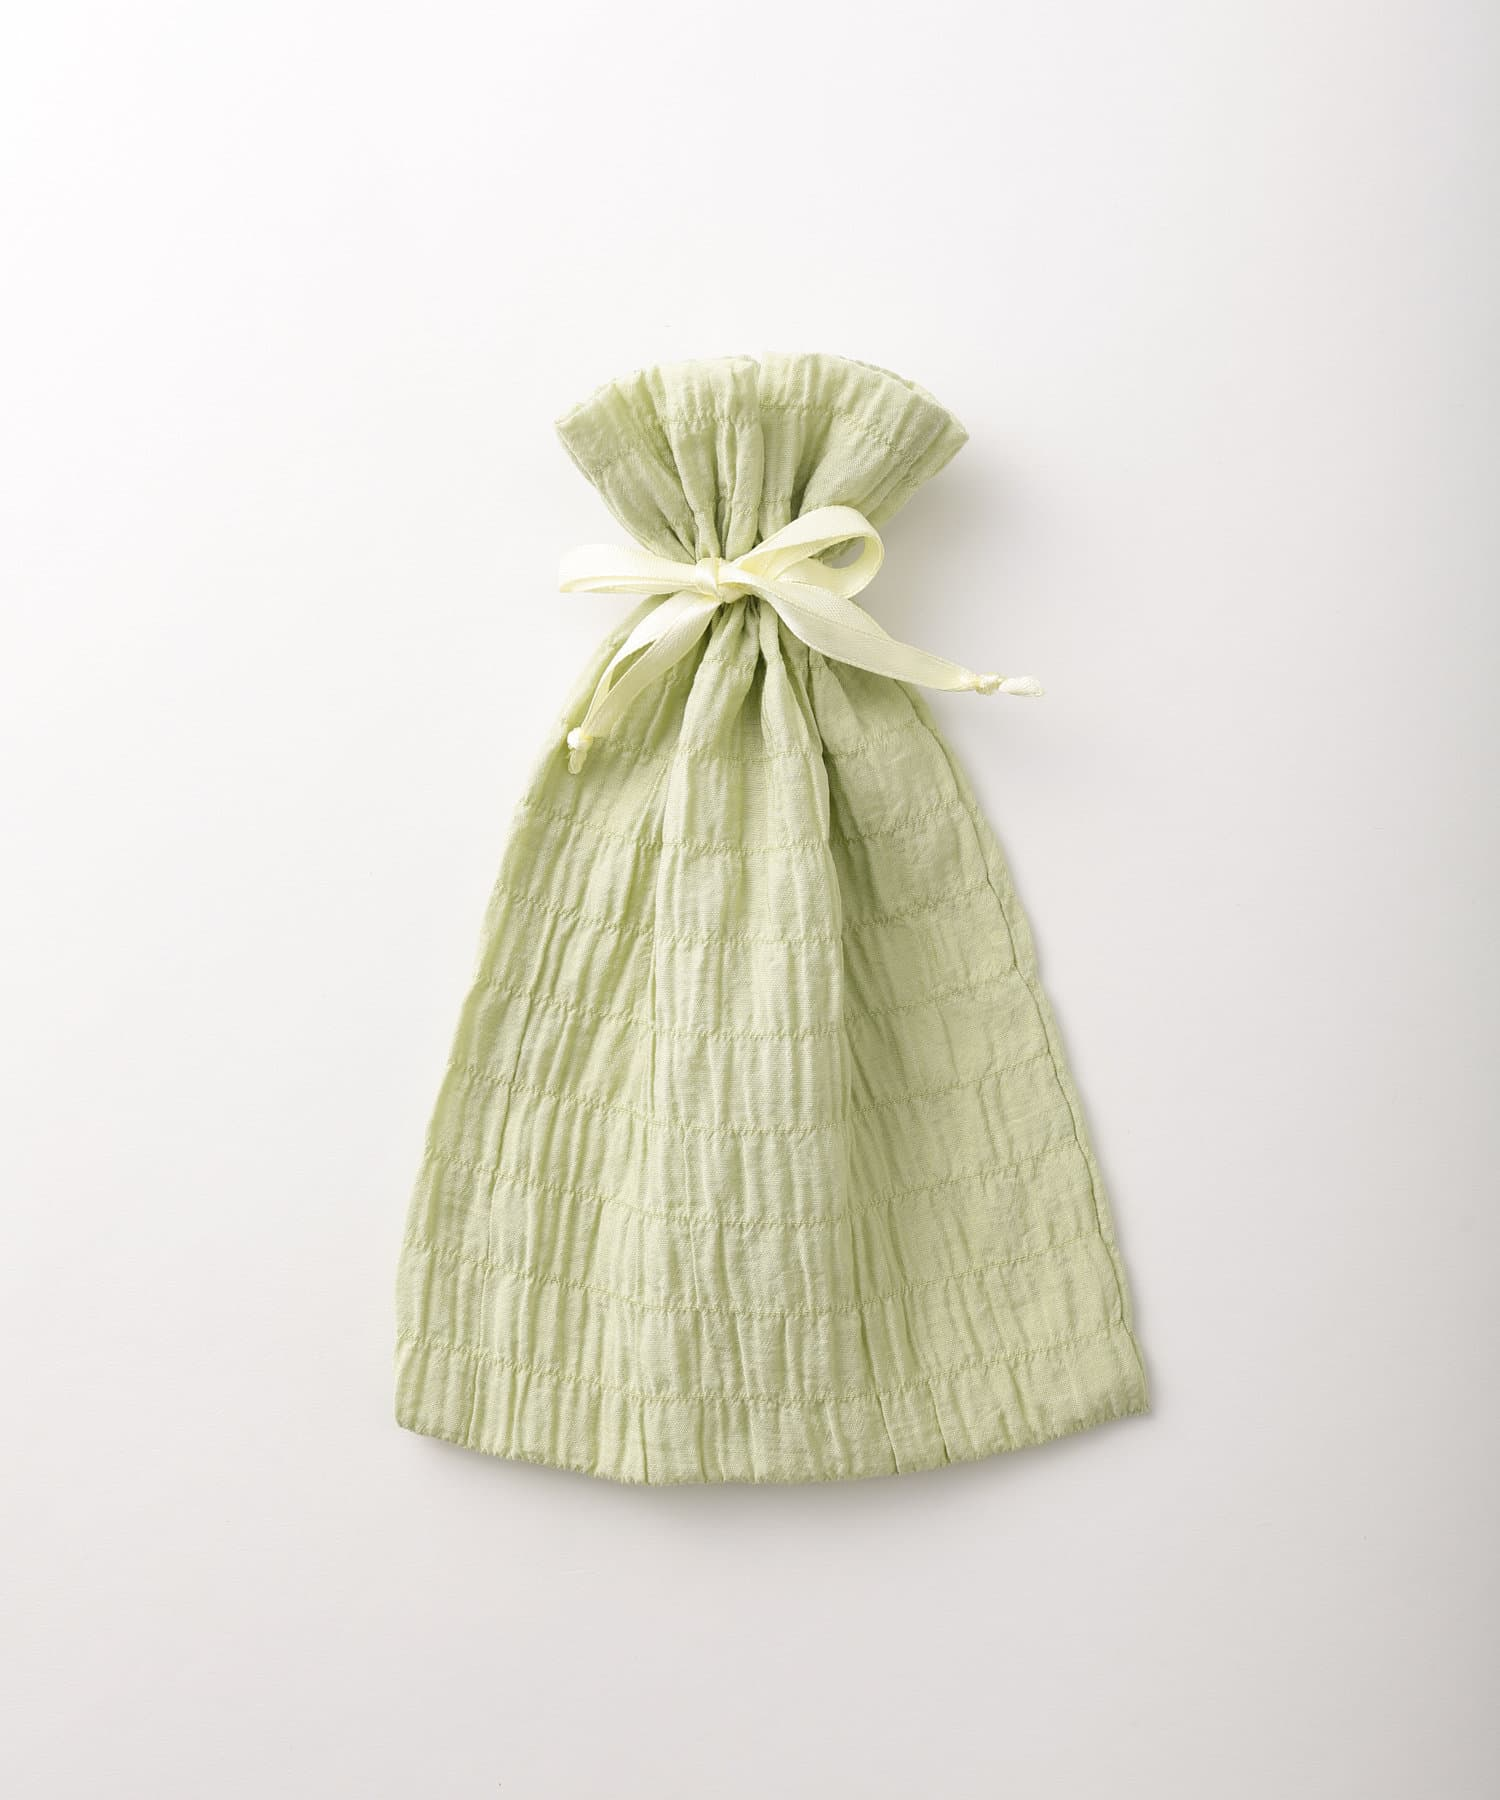 Lattice(ラティス) レディース シャーリング巾着ポーチM イエロー